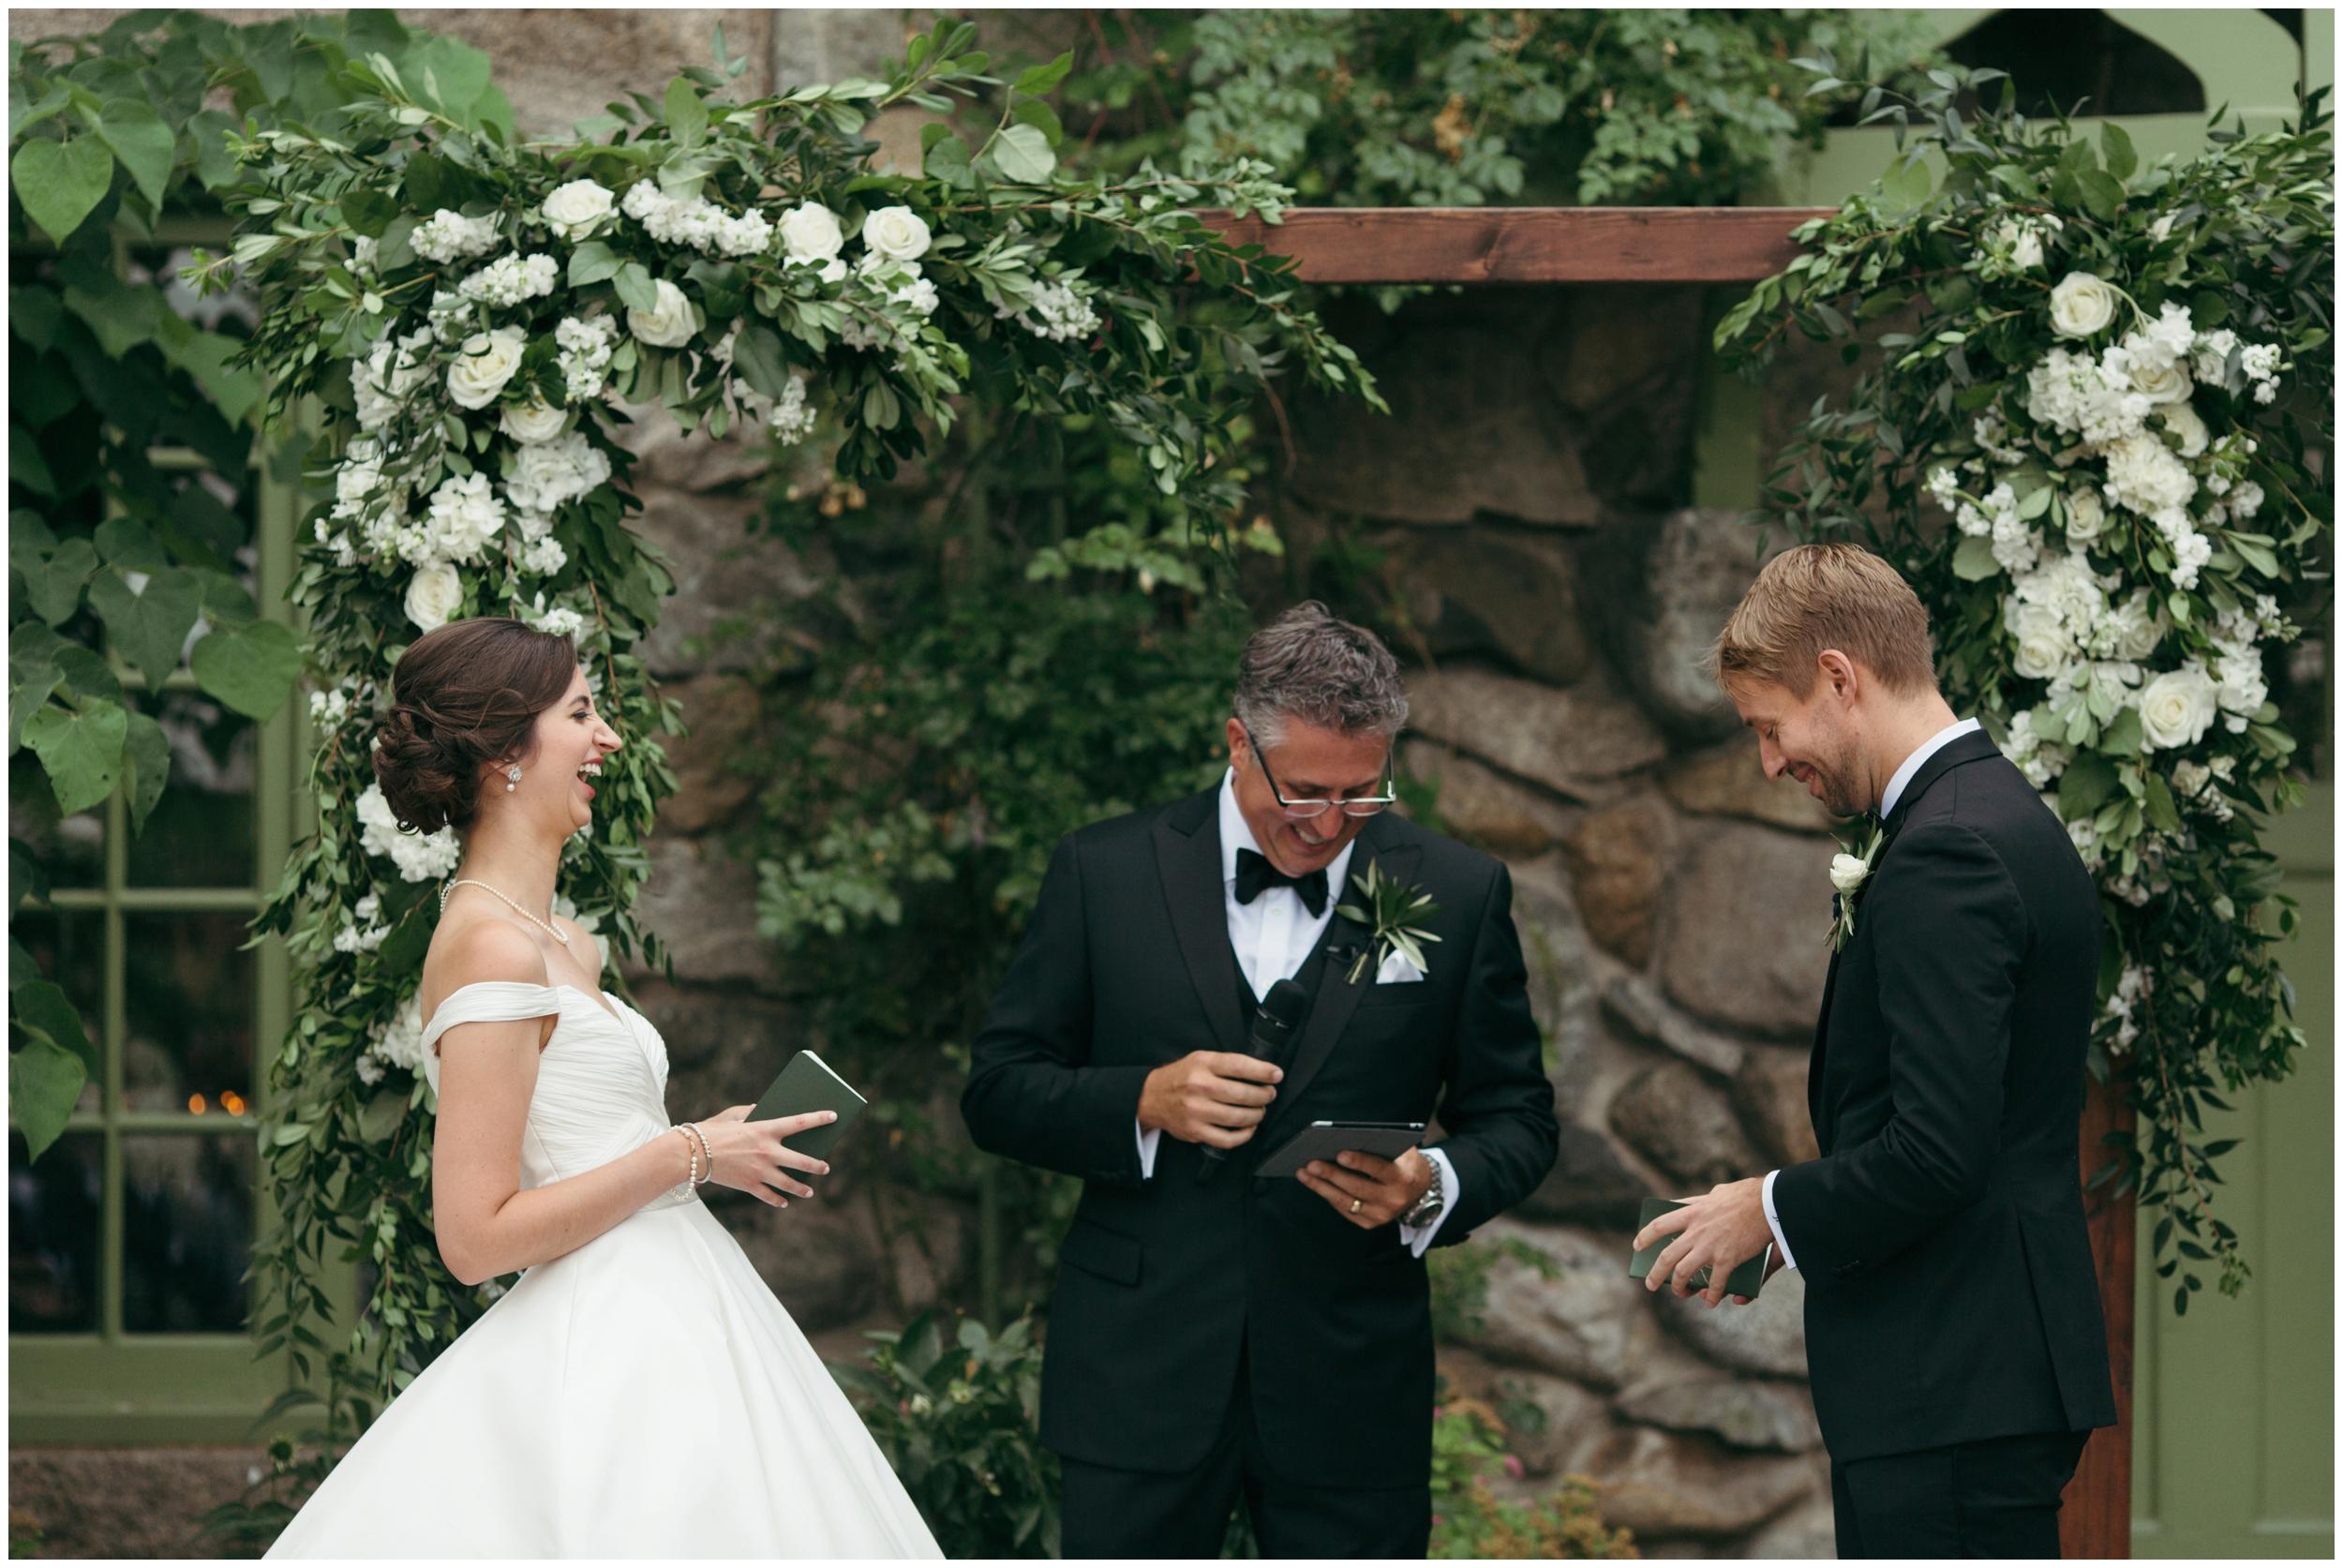 Willowdale-Estate-Wedding-Bailey-Q-Photo-Boston-Wedding-Photographer-037.JPG